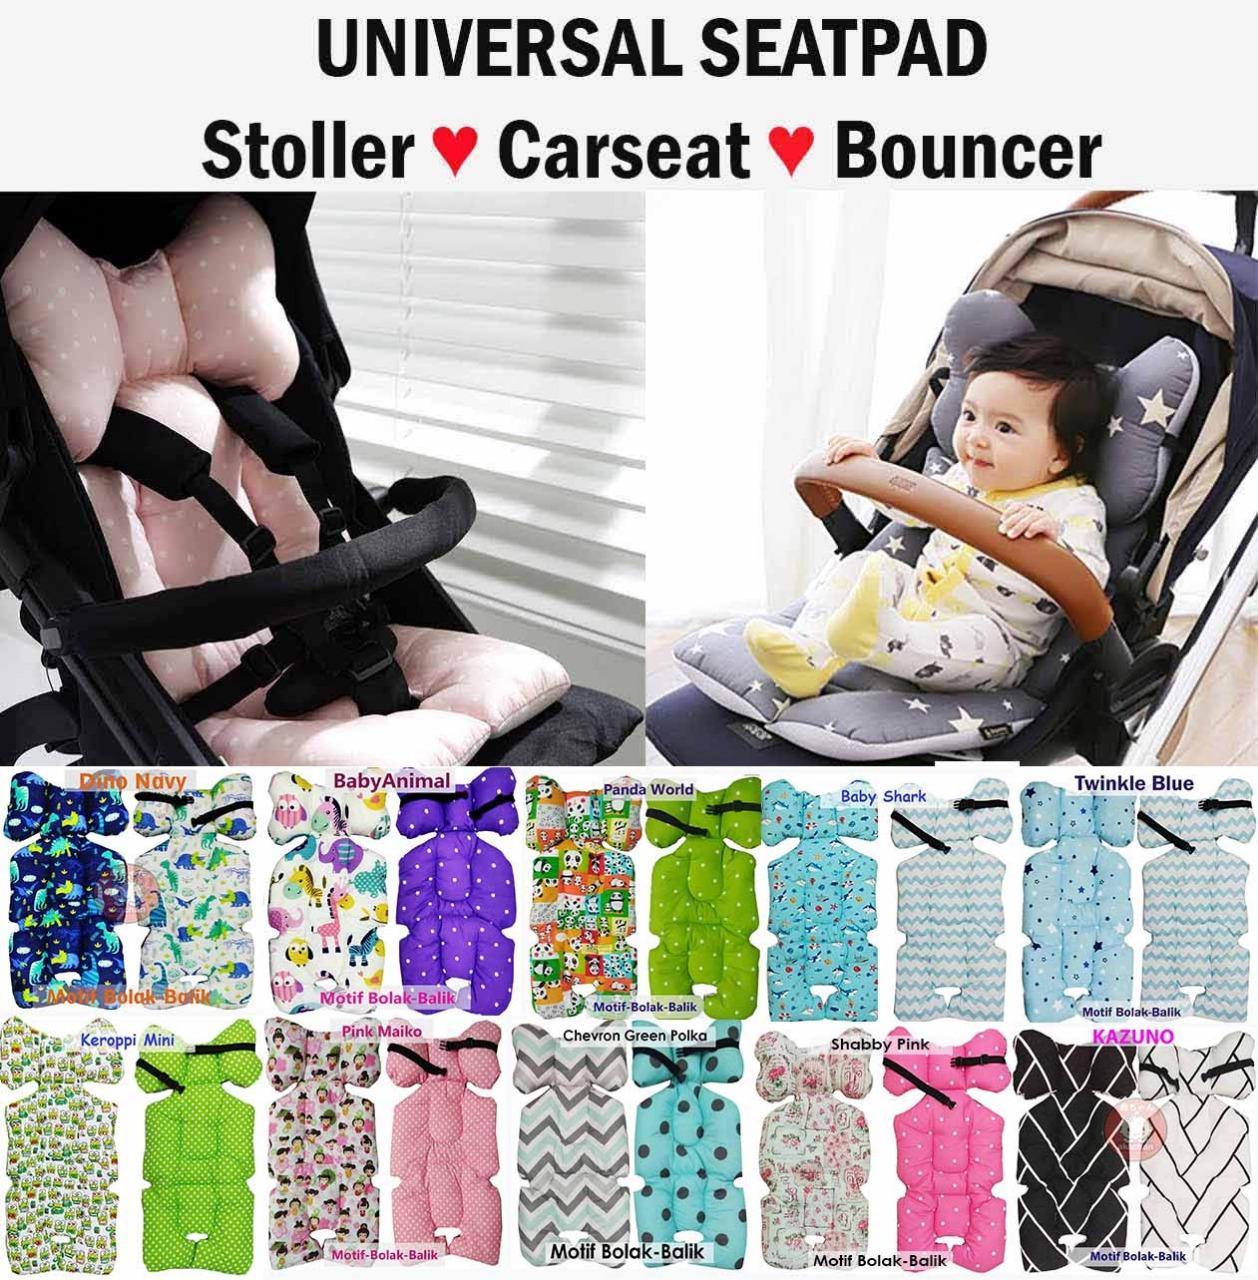 Universal Alas Stroller Pad Stroler Carseat Bouncer Akachan Kereta Dorong Seatpad Borny Liner Car Seat Highchair High Chair By Little Diva.